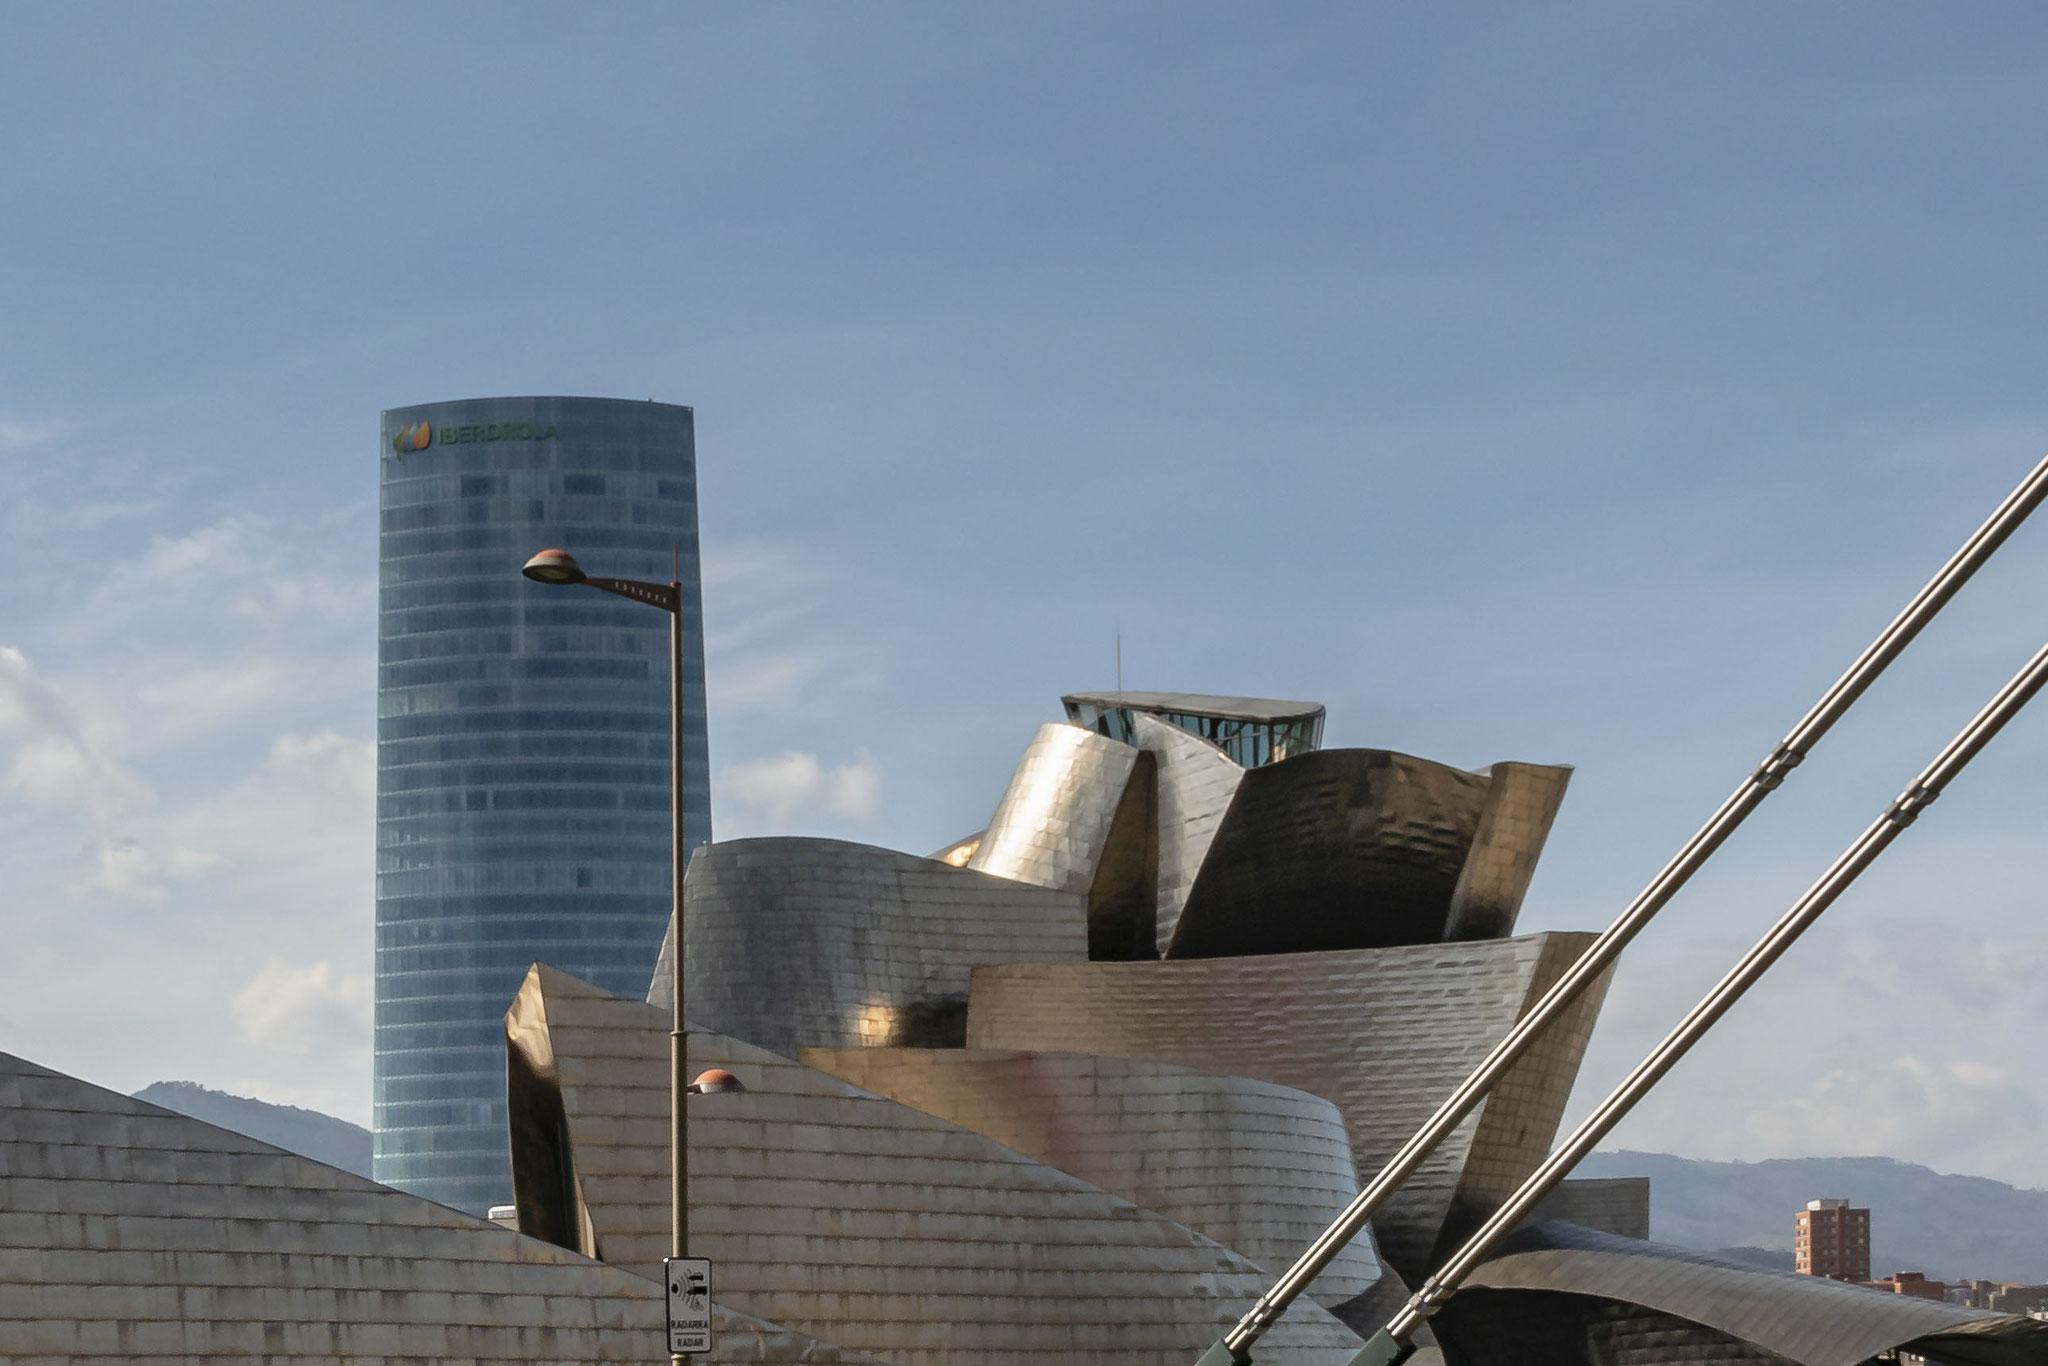 Catherine SEVALLE - Le musée Guggenheim à Bilbao